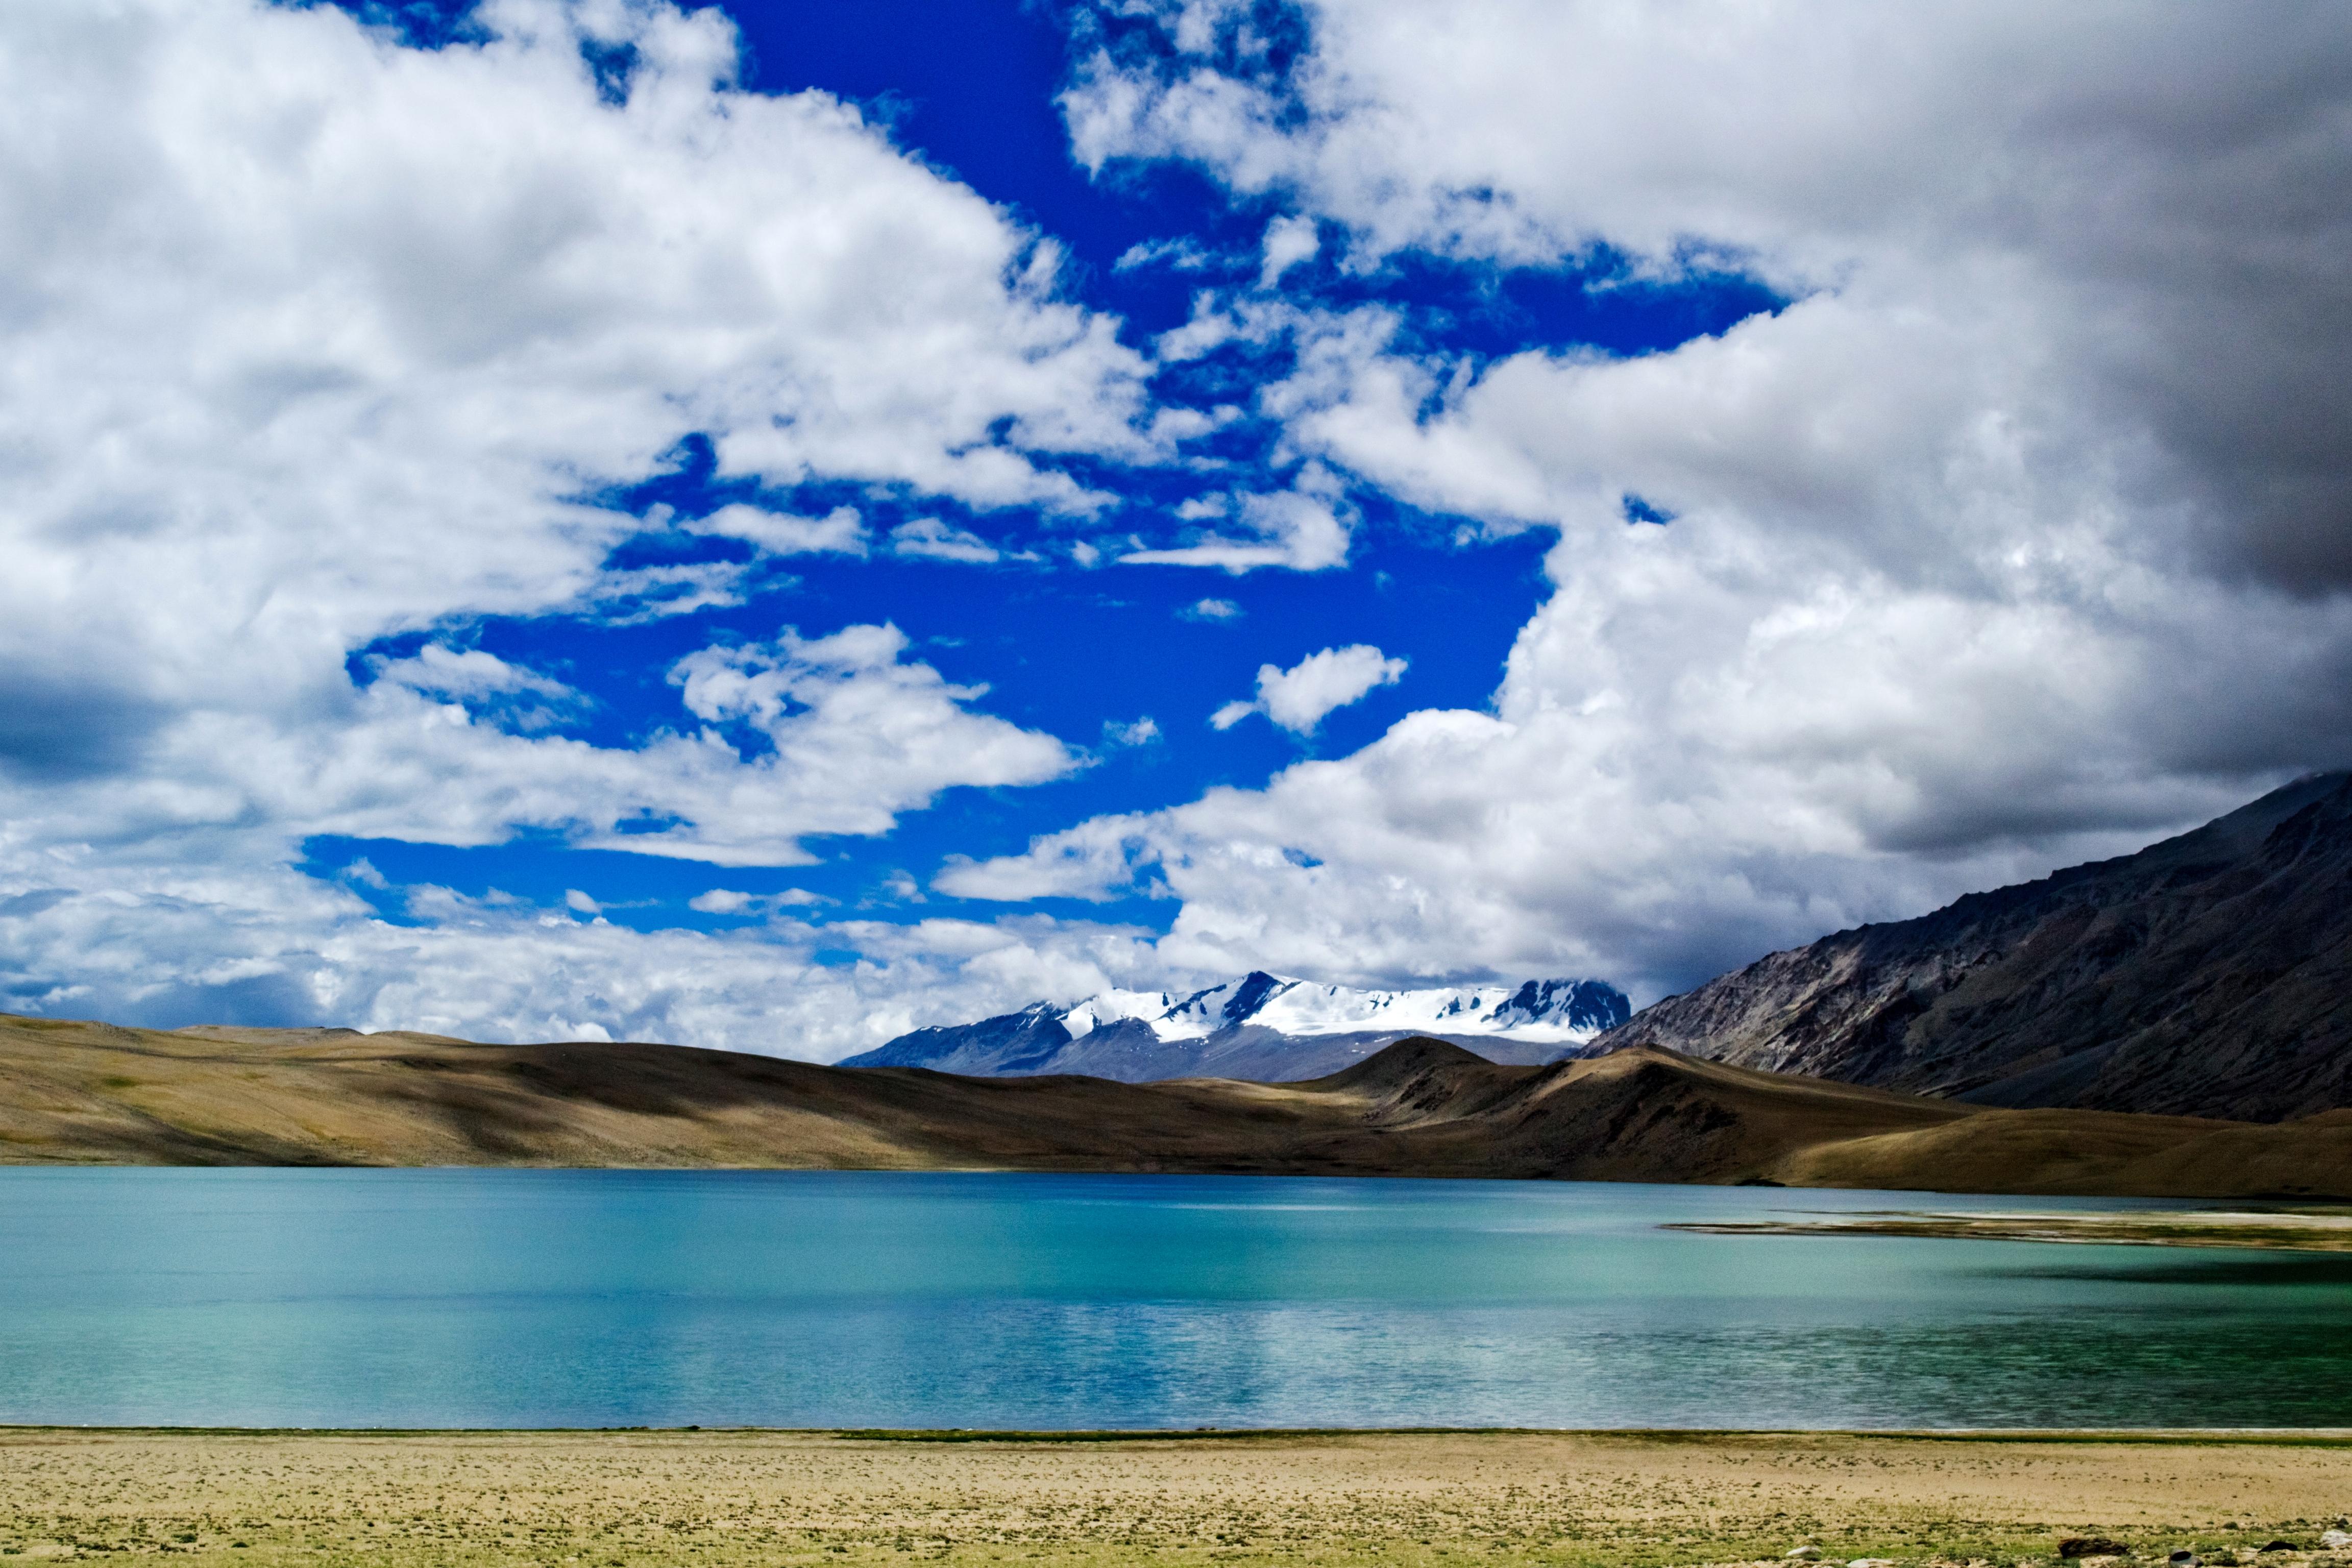 A view of the high altitude Tso Moriri lake